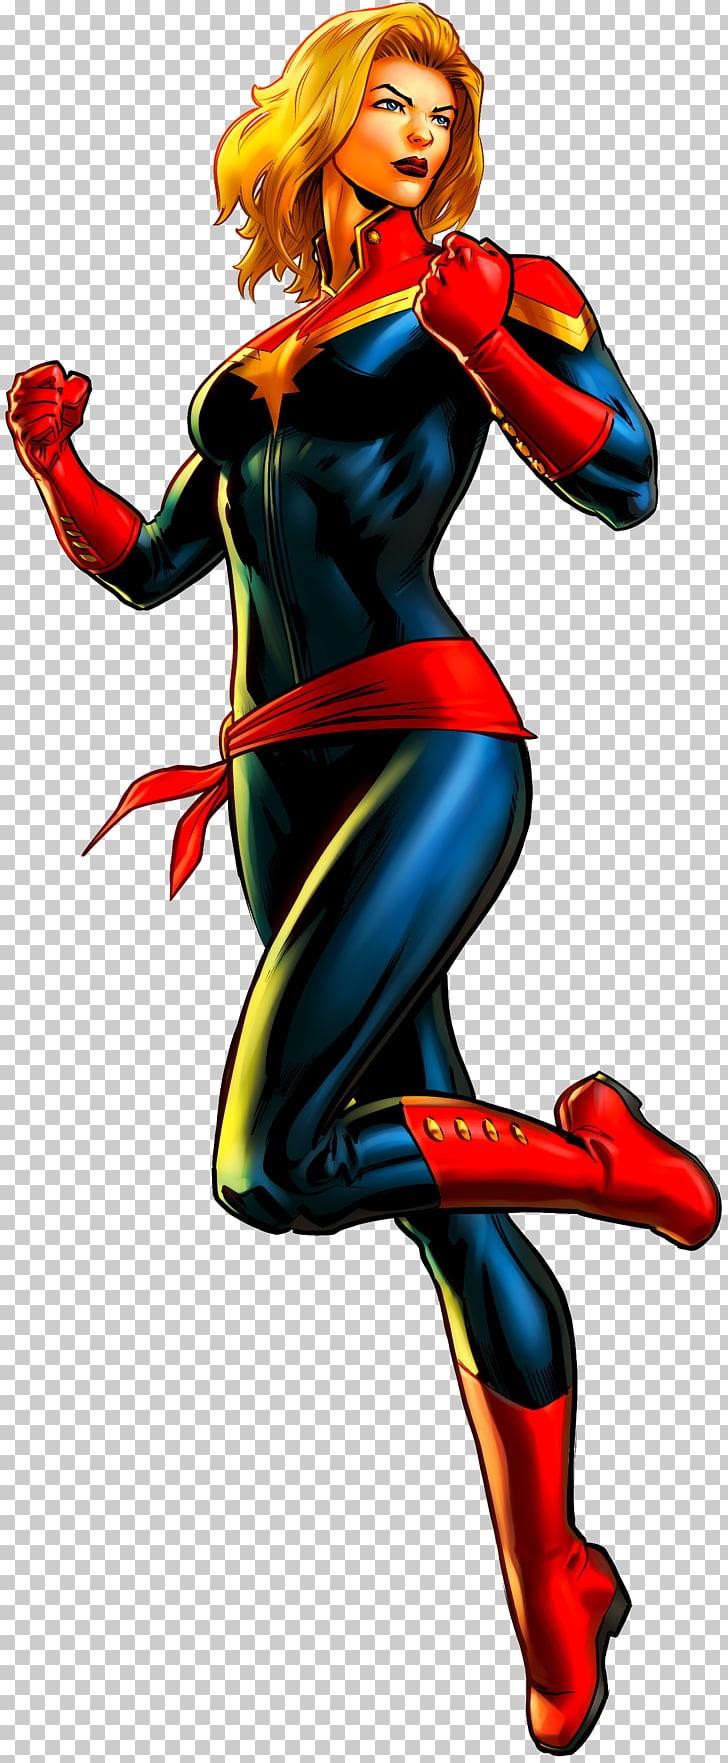 Marvel: Avengers Alliance Black Widow Captain America Carol.